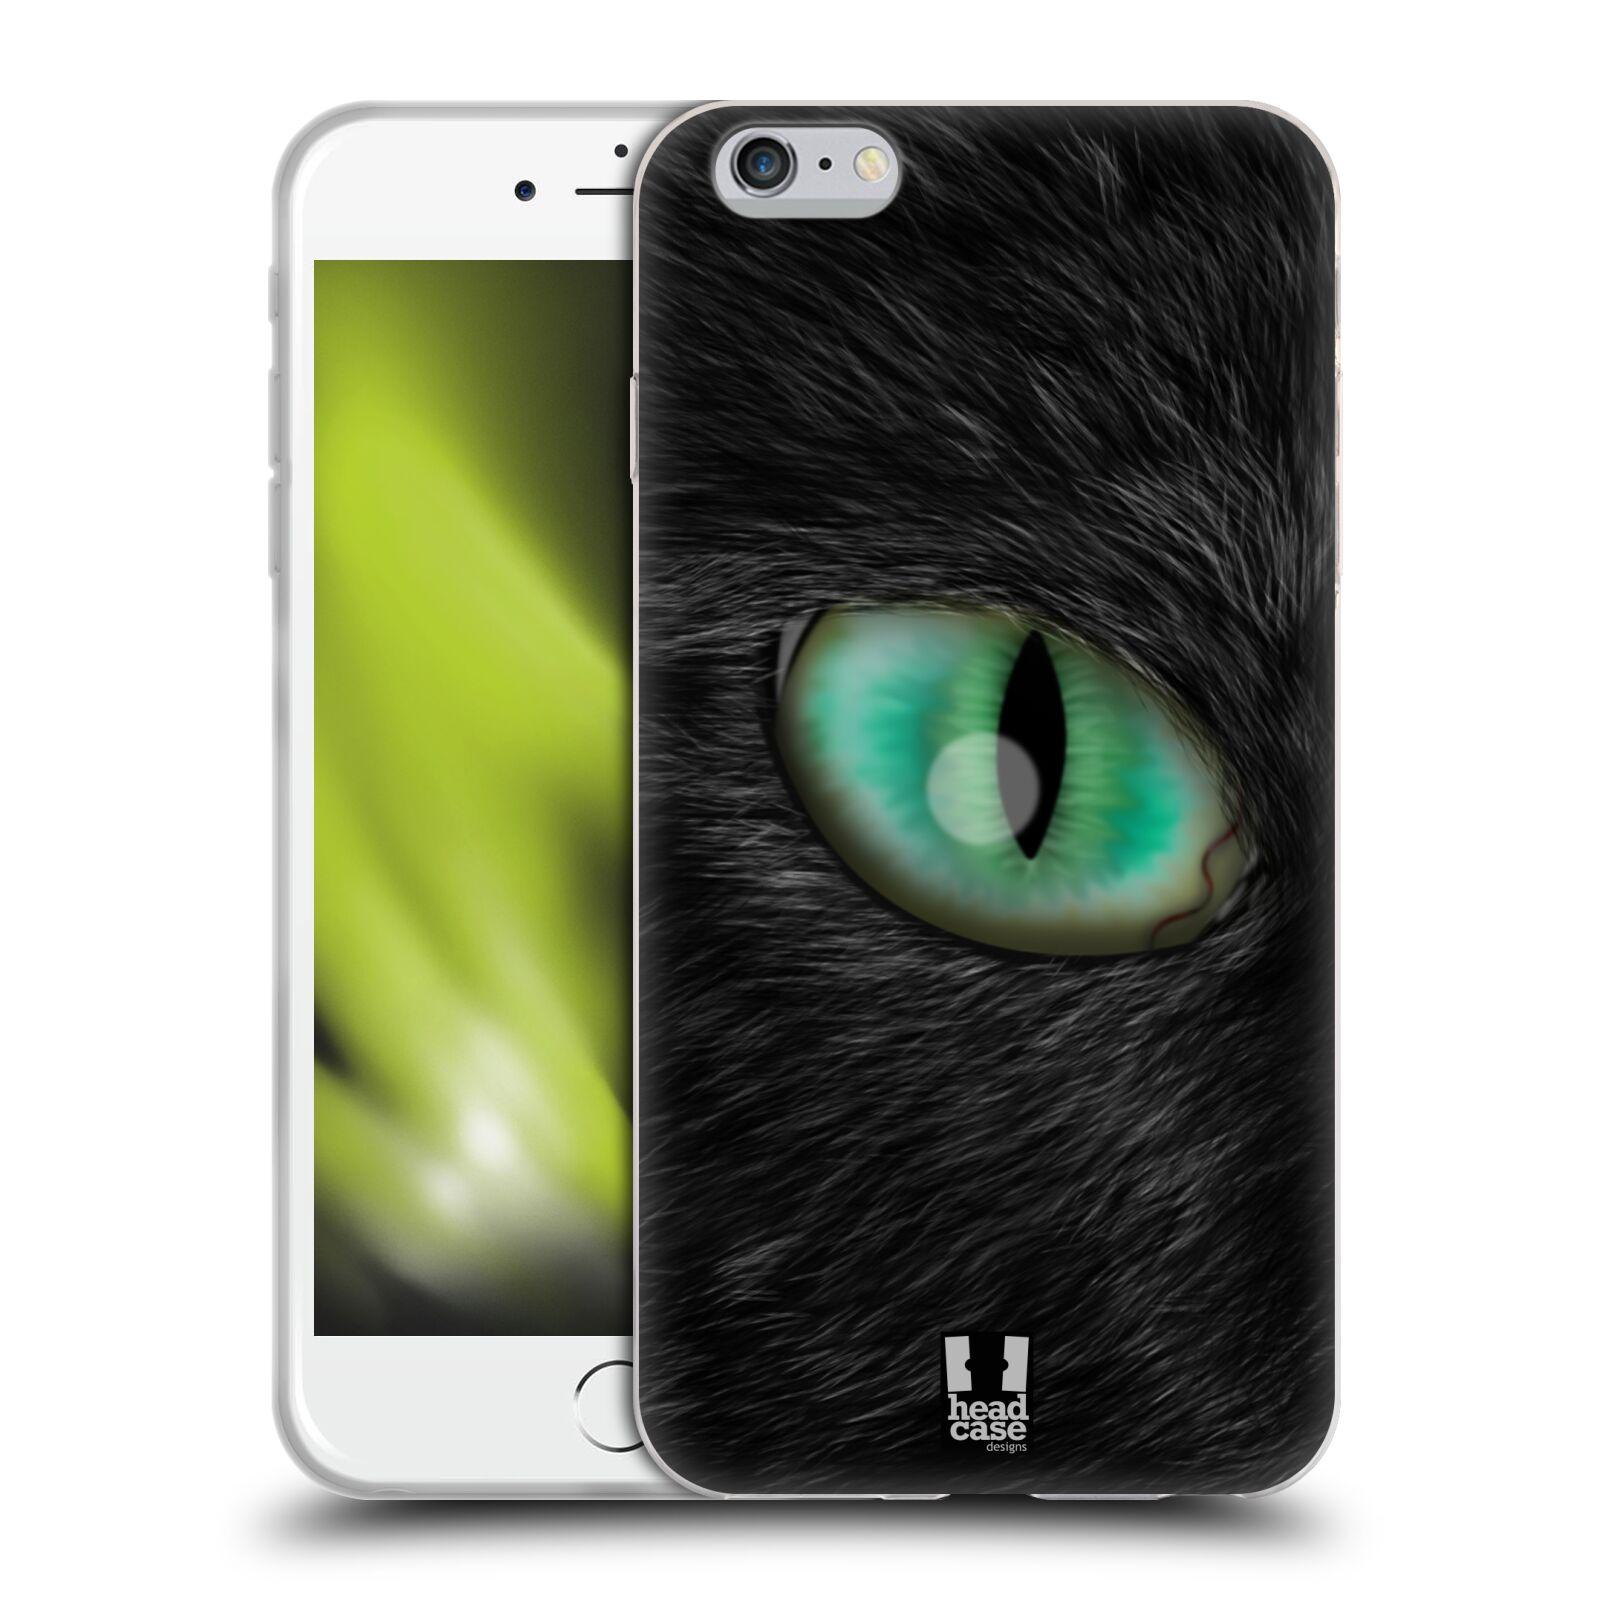 HEAD CASE silikonový obal na mobil Apple Iphone 6 PLUS/ 6S PLUS vzor pohled zvířete oko kočka